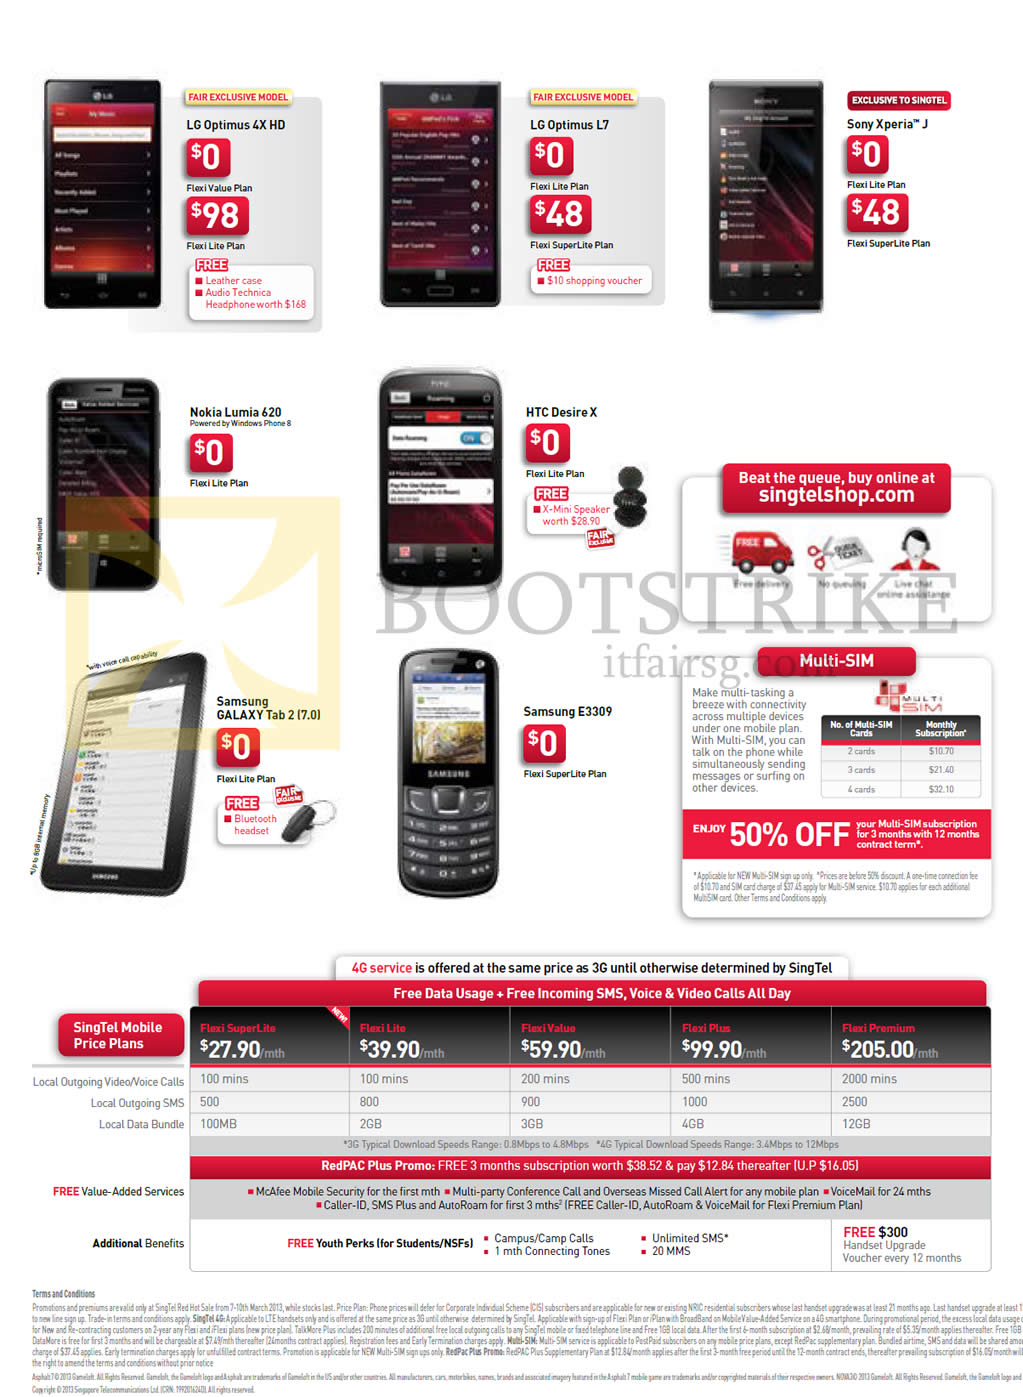 IT SHOW 2013 price list image brochure of Singtel Mobile Phones LG Optimus 4X HD, L7, Sony Xperia J, Nokia Lumia 620, HTC Desire X, Samsung E3309, Galaxy Tab 7.0